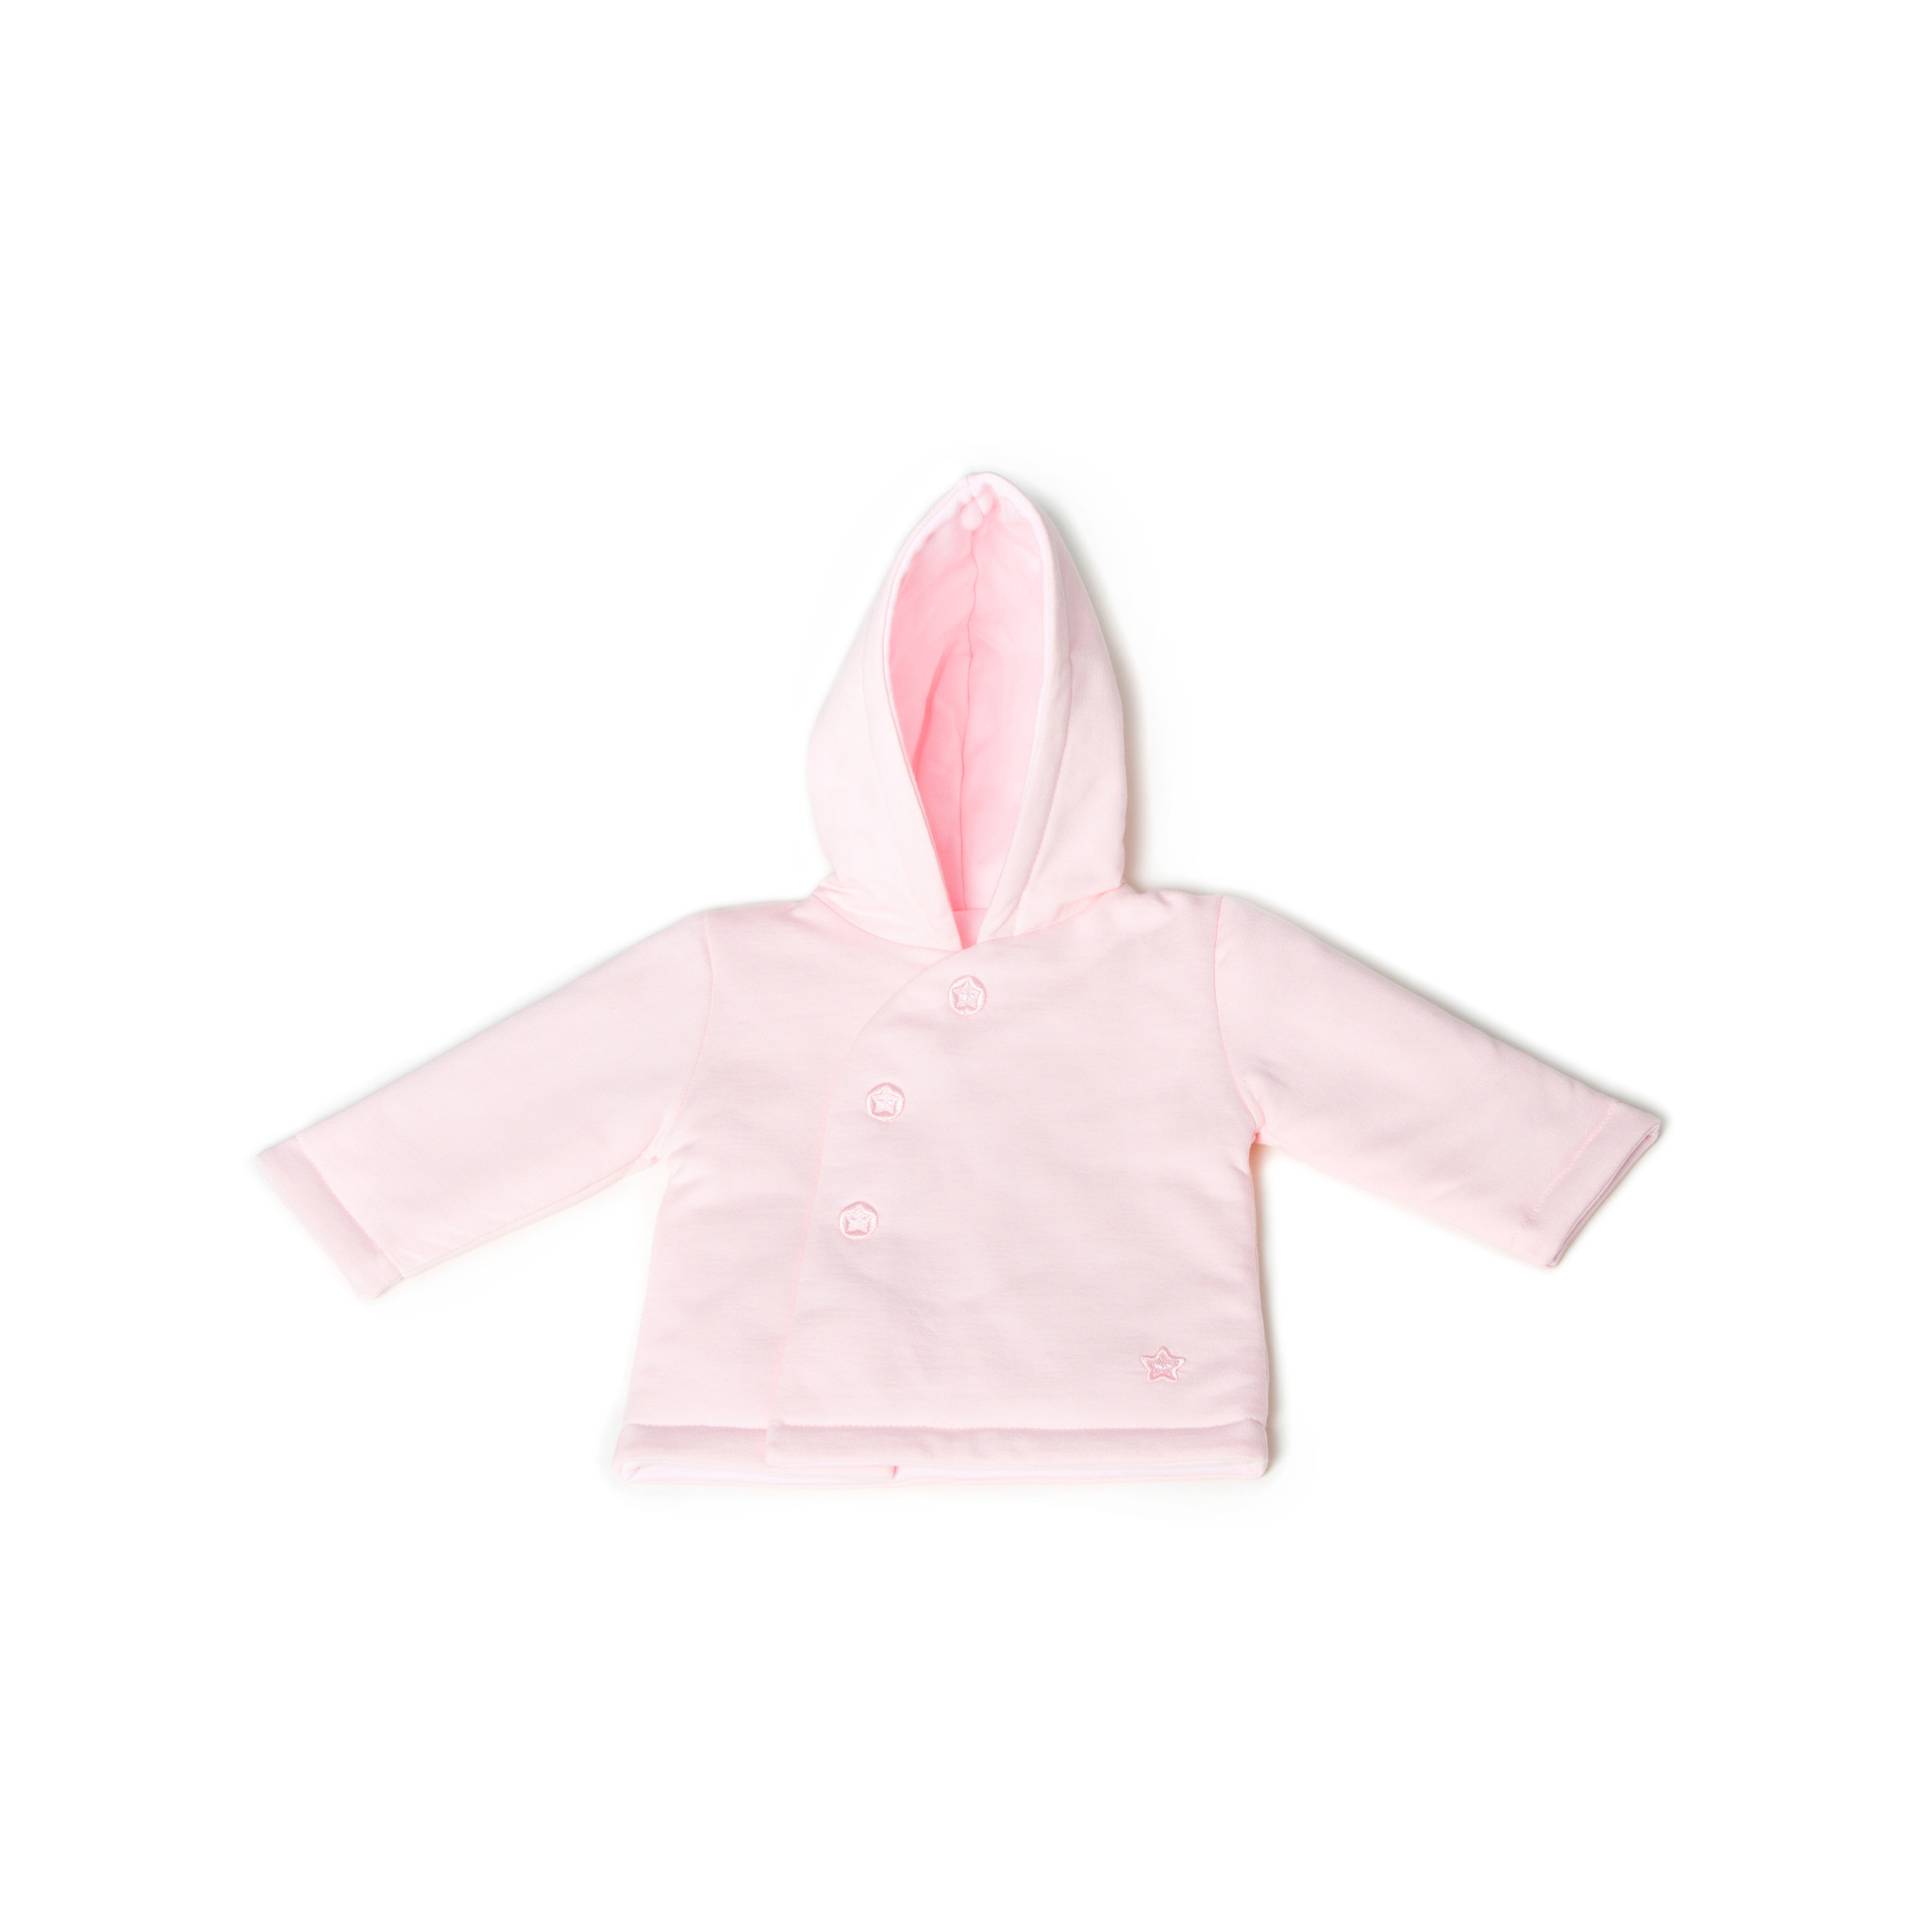 Little Lads & Ladies Pink Pram Jacket LL06